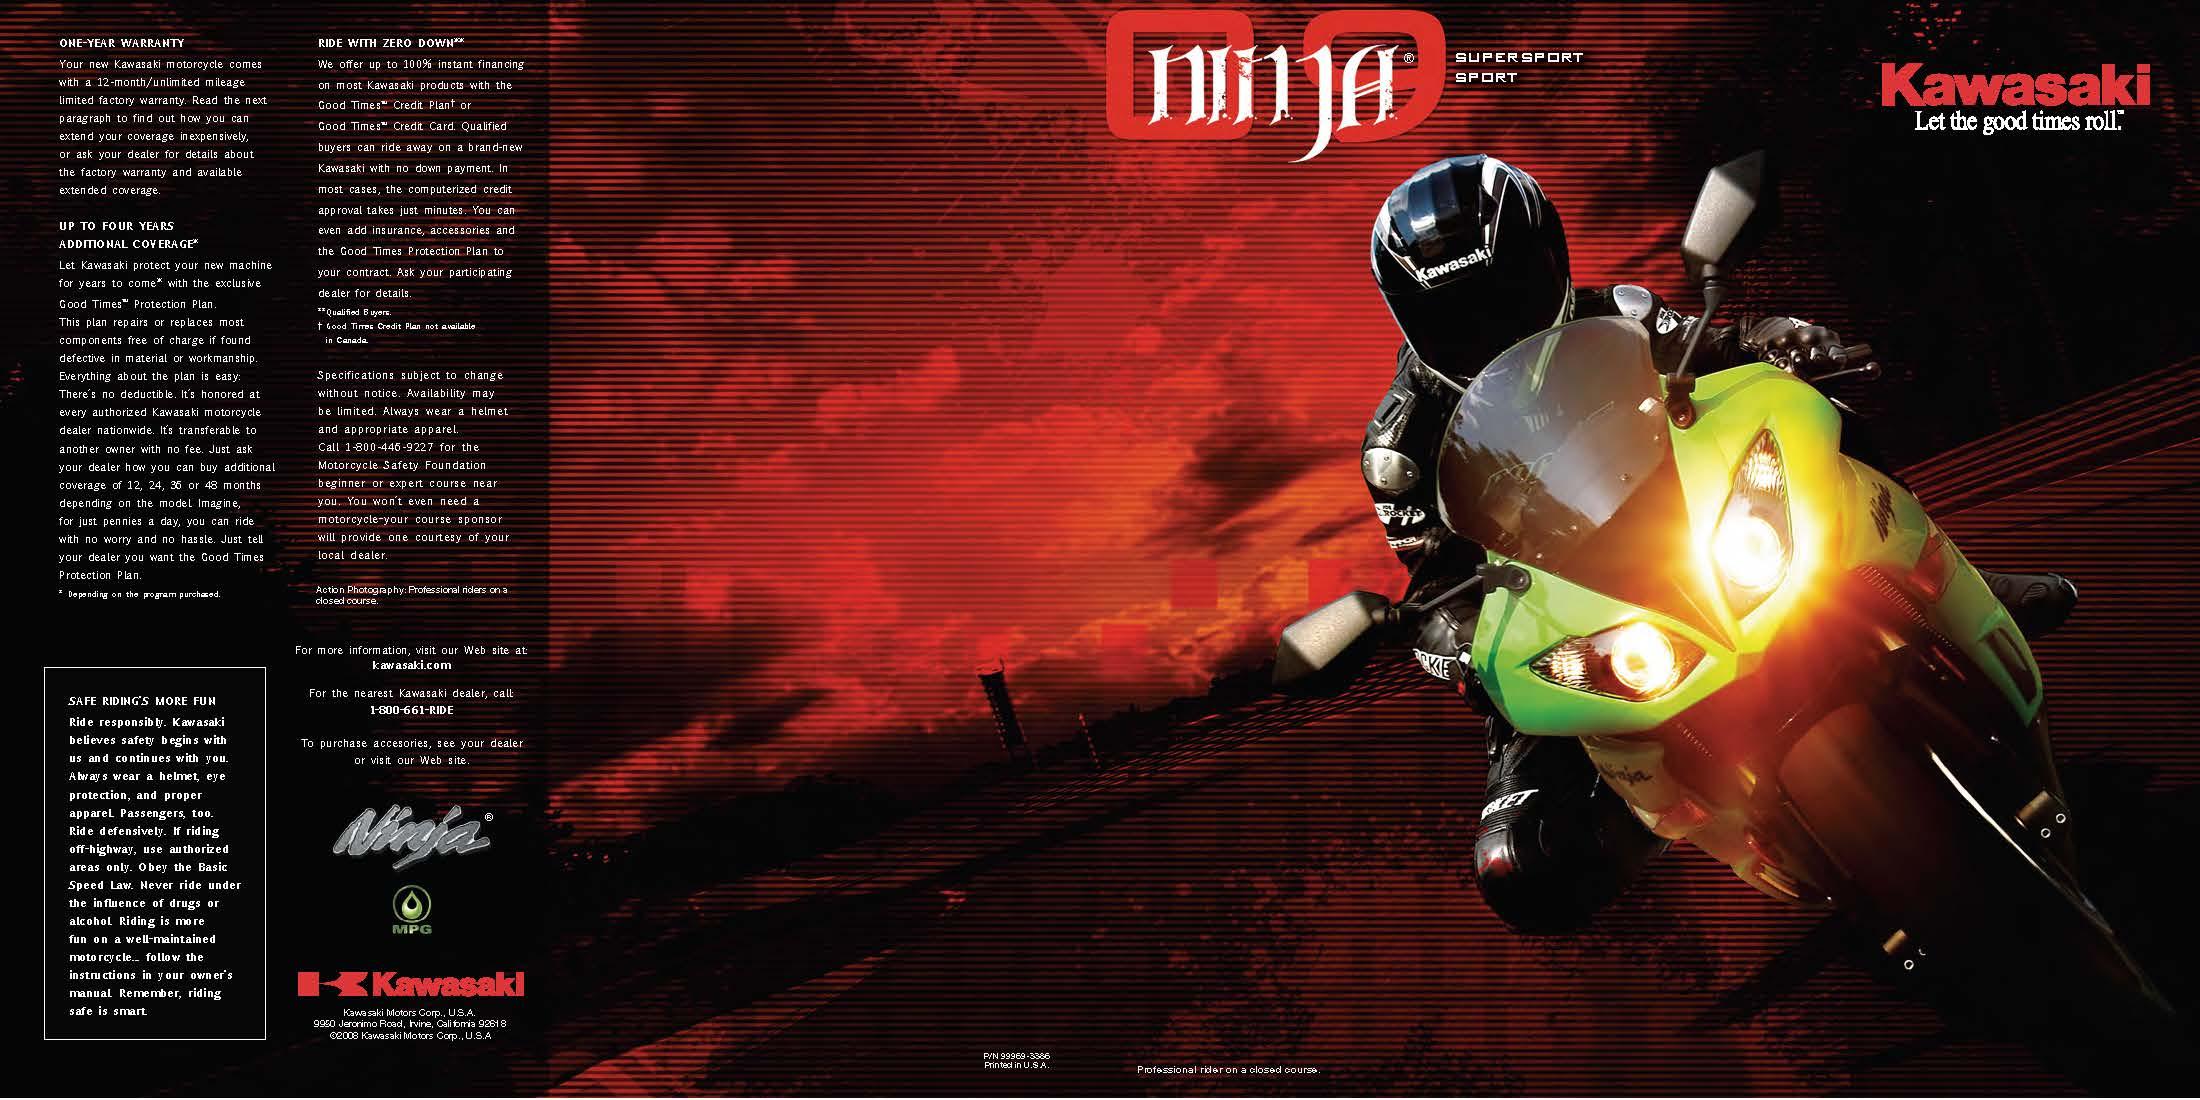 MY09_NinjaBrochure_Page_1.jpg